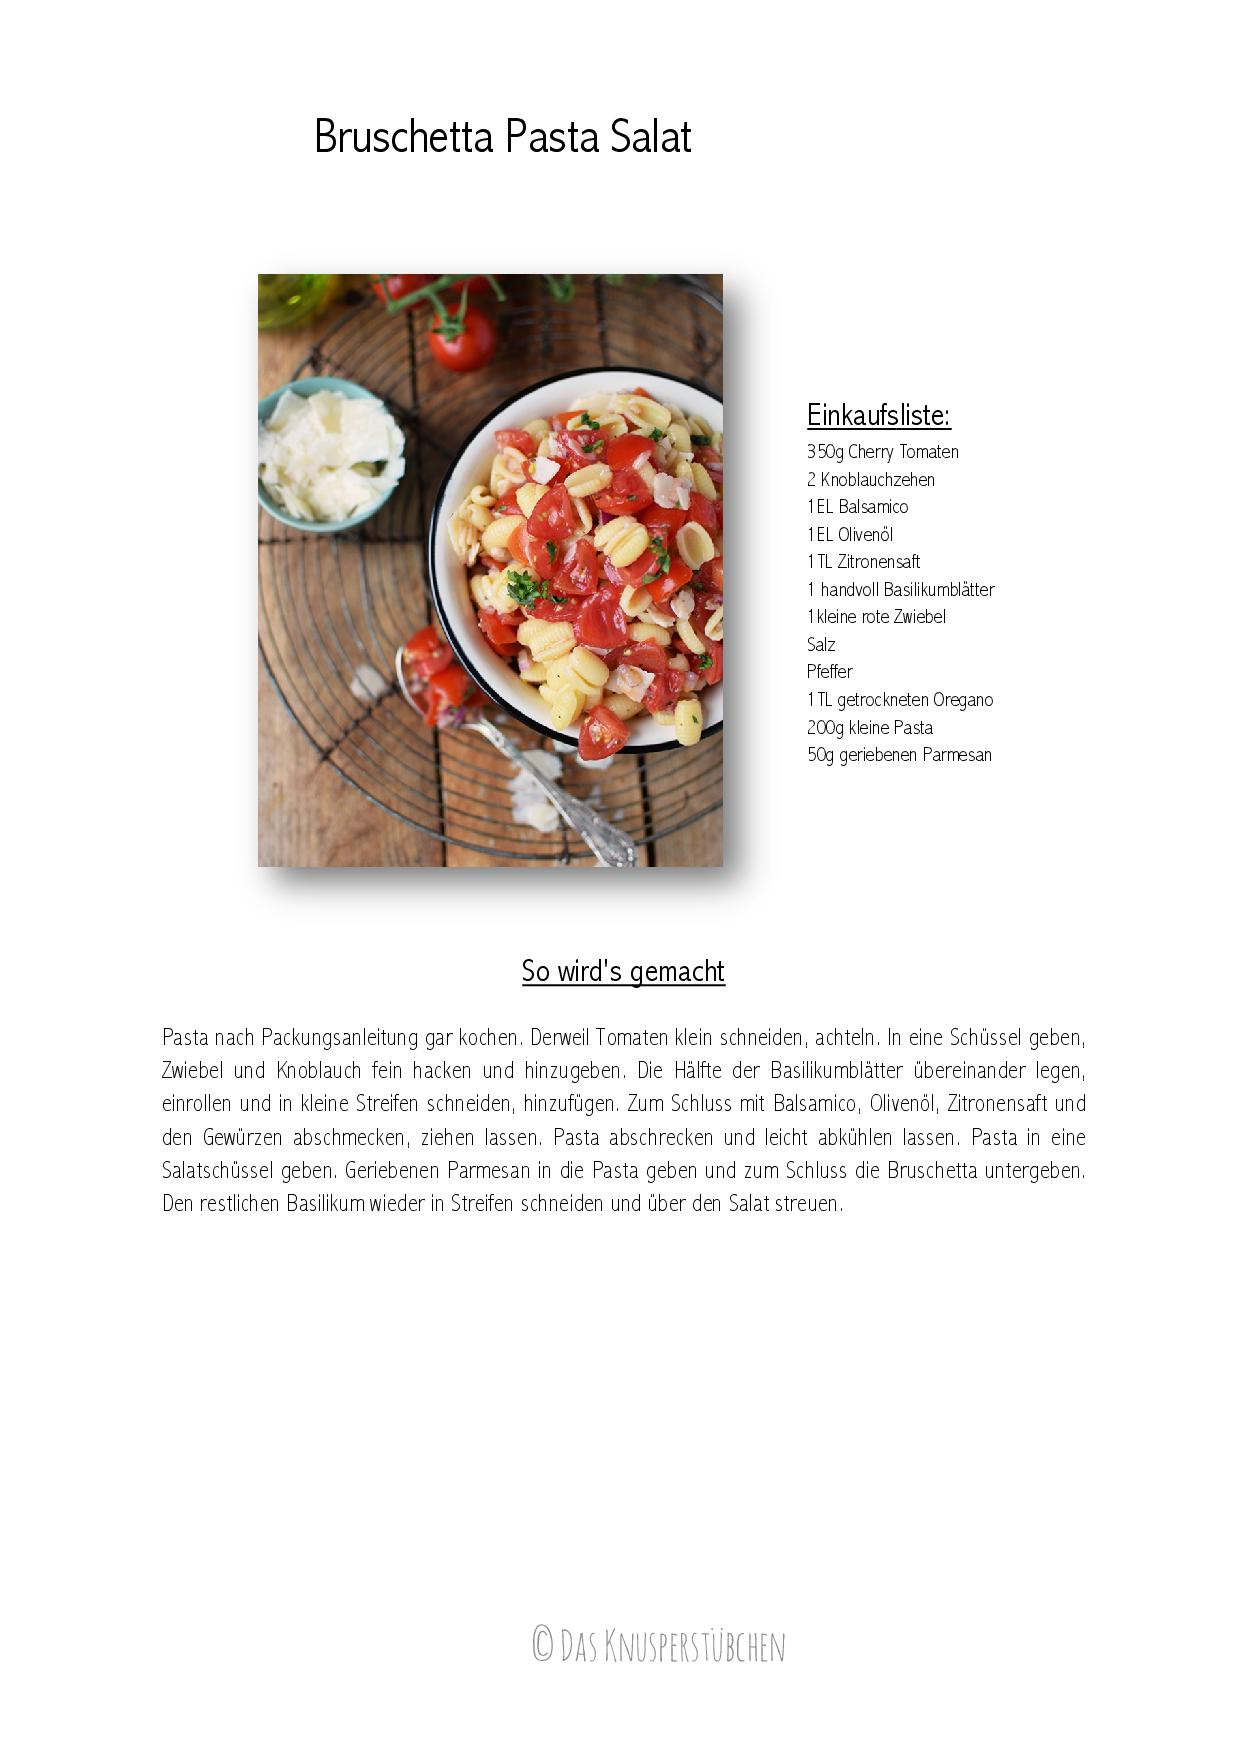 Bruschetta Pasta Salat Rezept-001